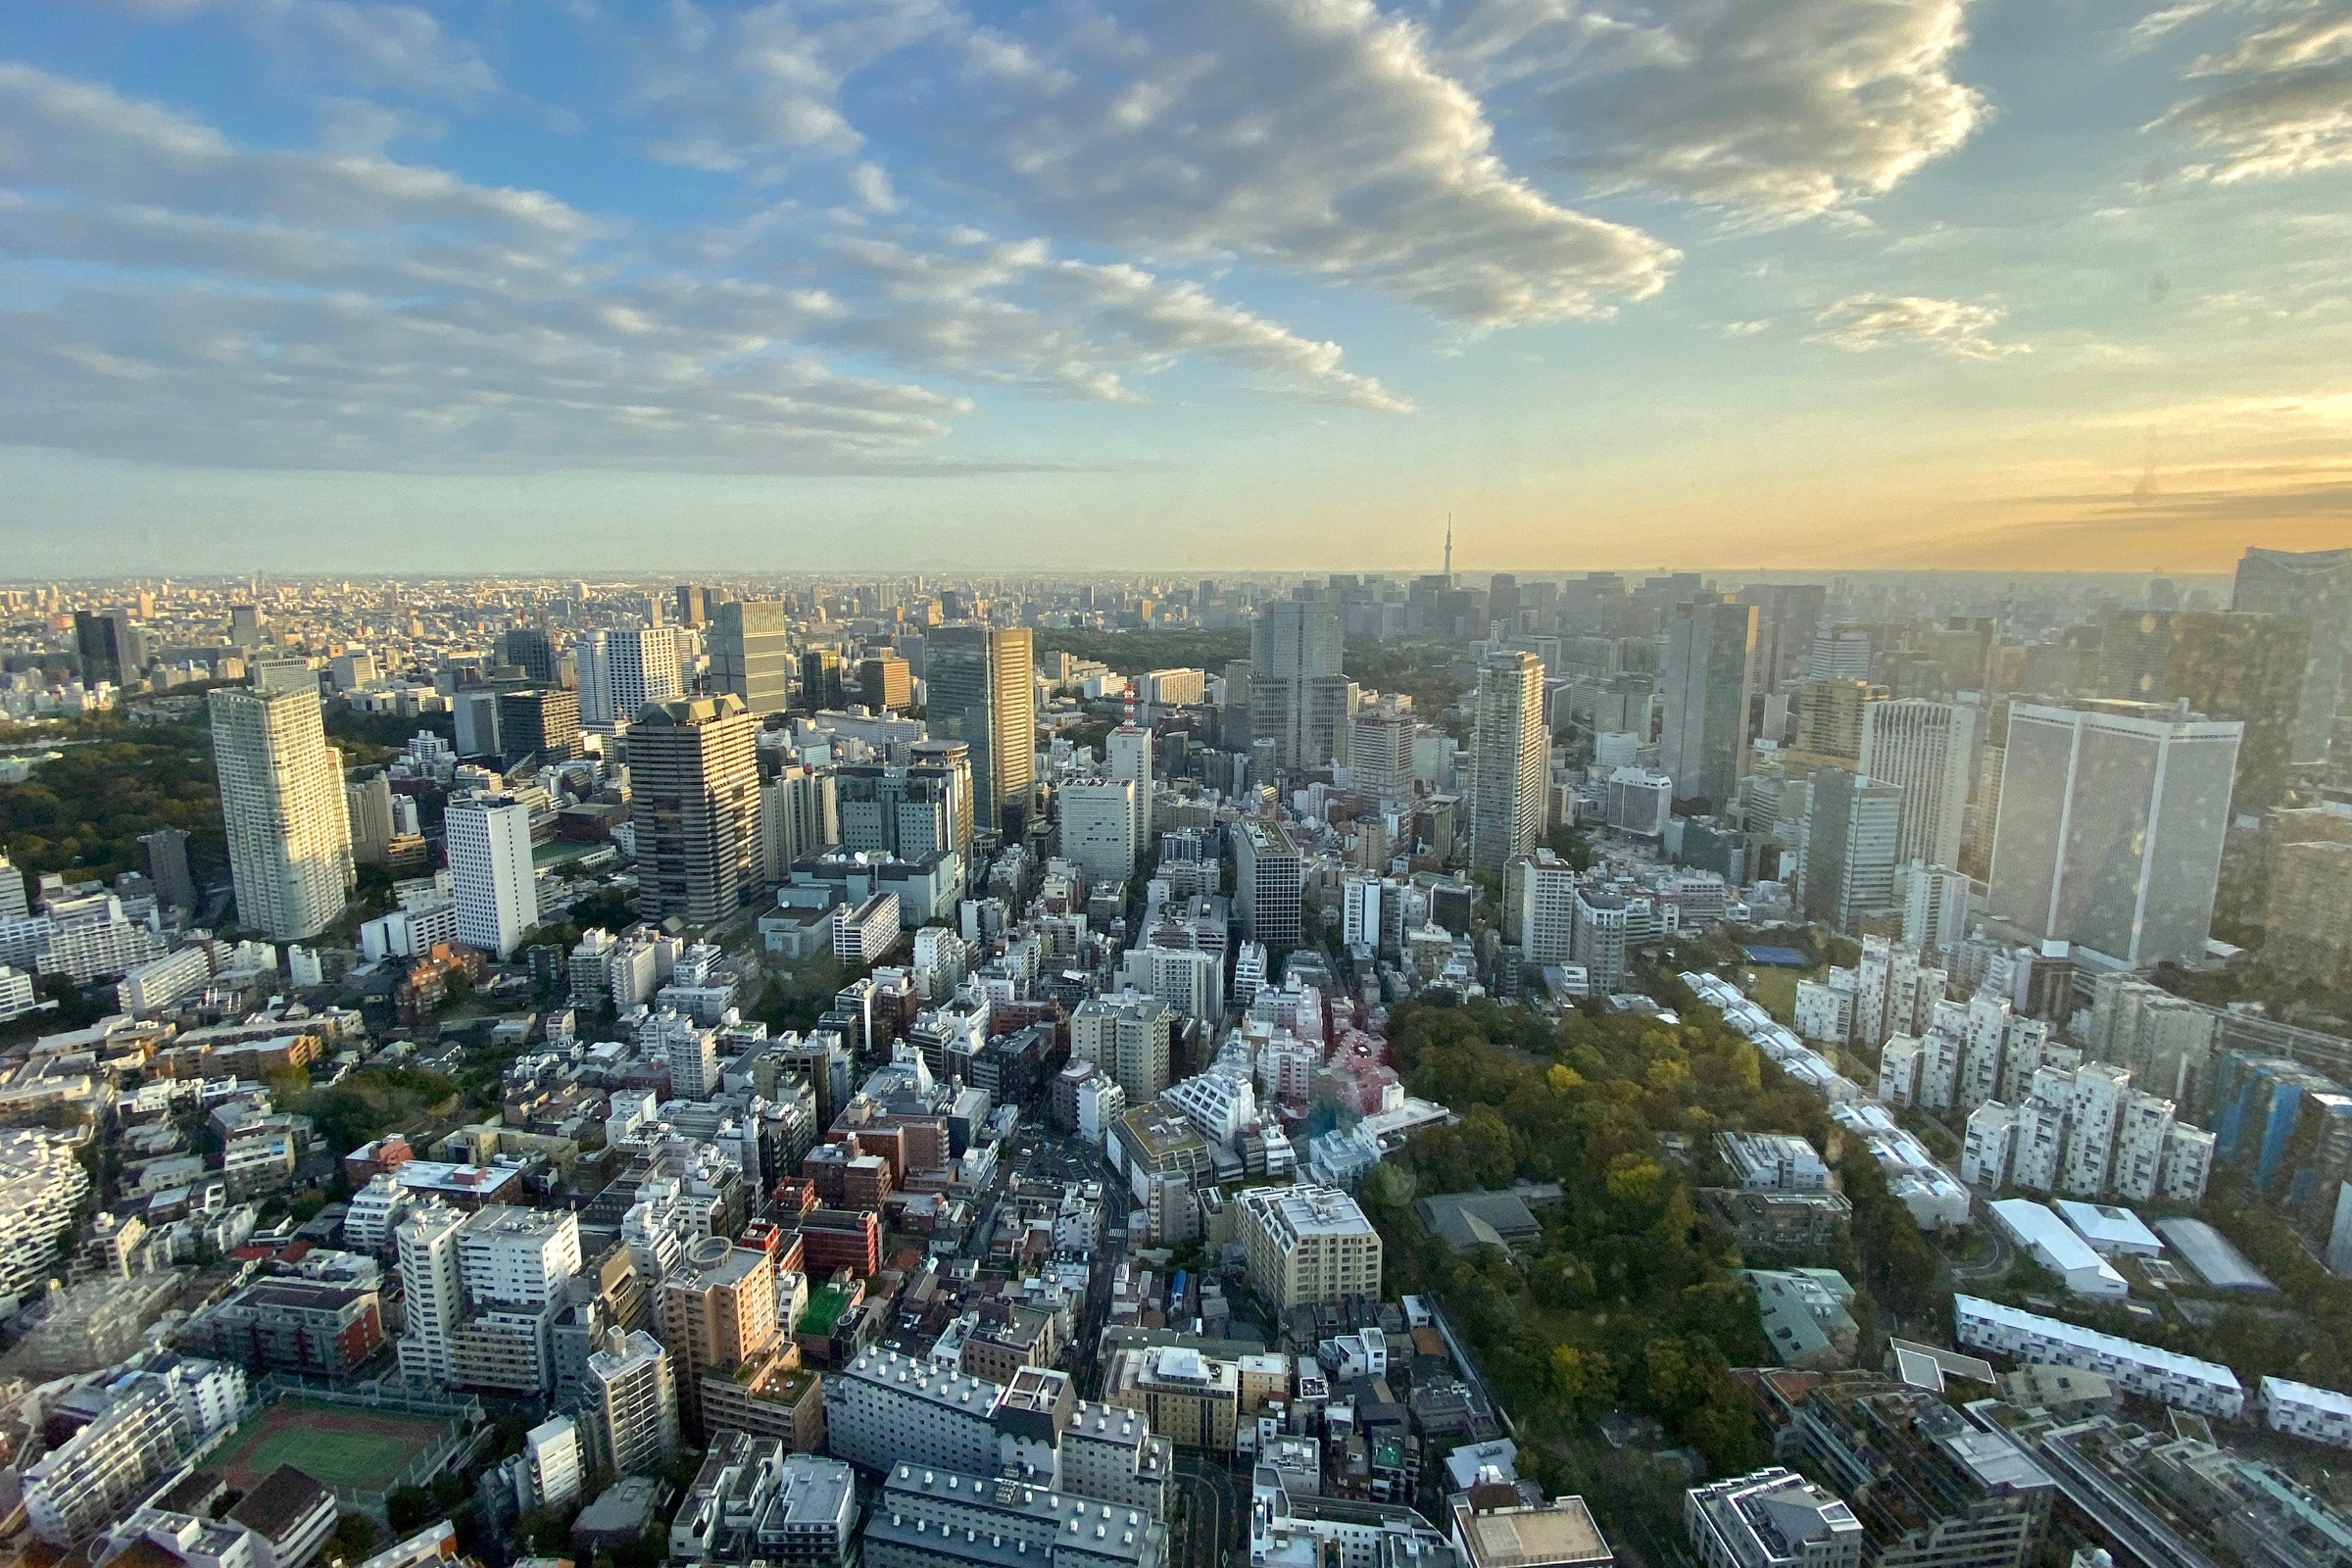 Mixed bag: A review of The Ritz-Carlton, Tokyo